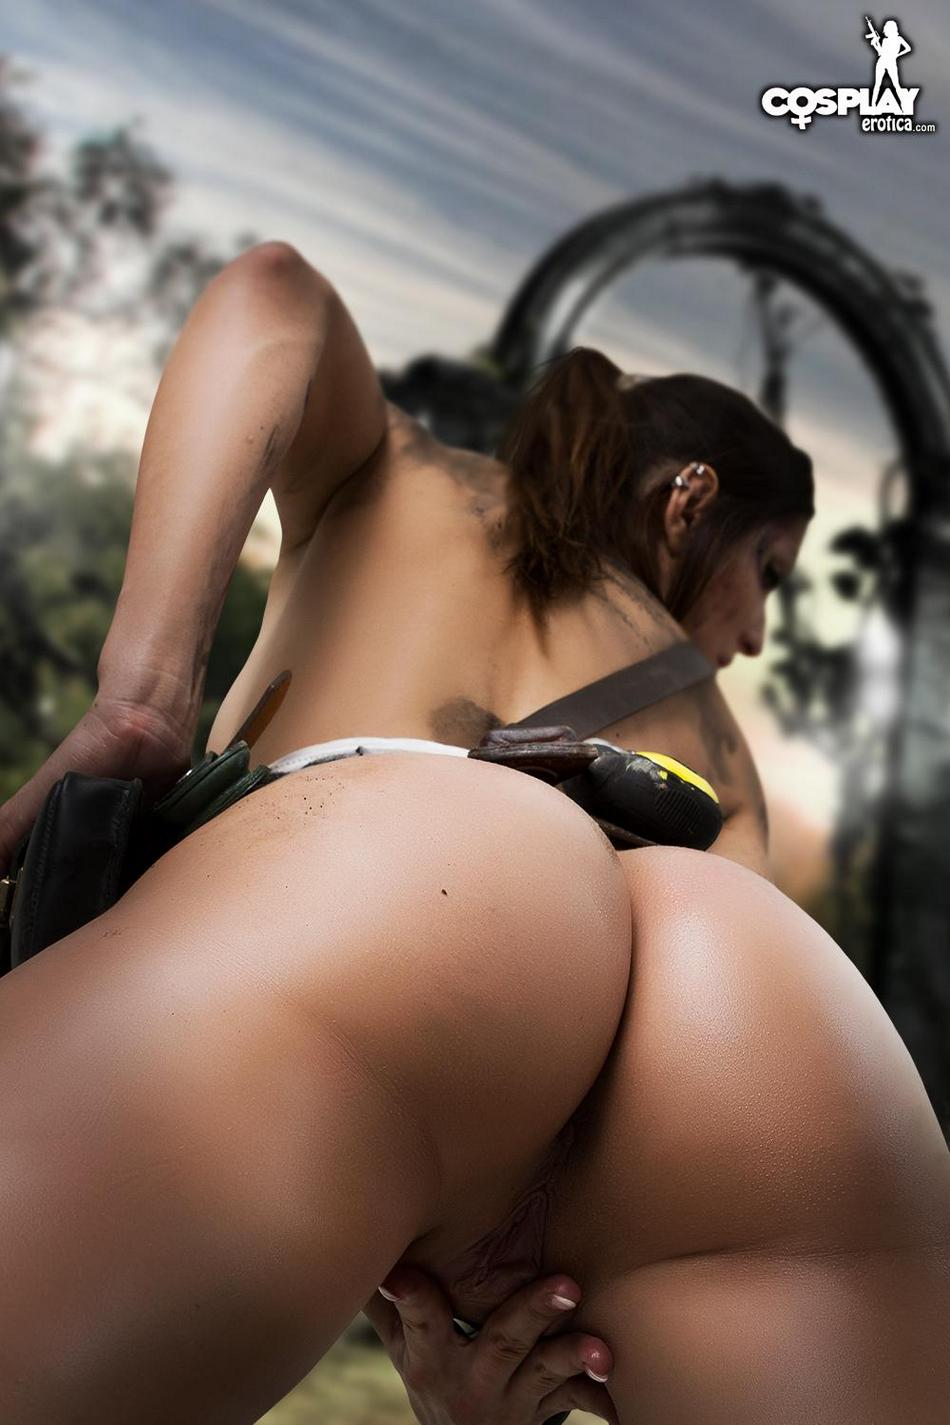 xlara-croft-porno-coslpay-erotica_c57eefe1fad828370d7ca8a3bd9c7911.jpg.pagespeed.ic.--J_gD05-z